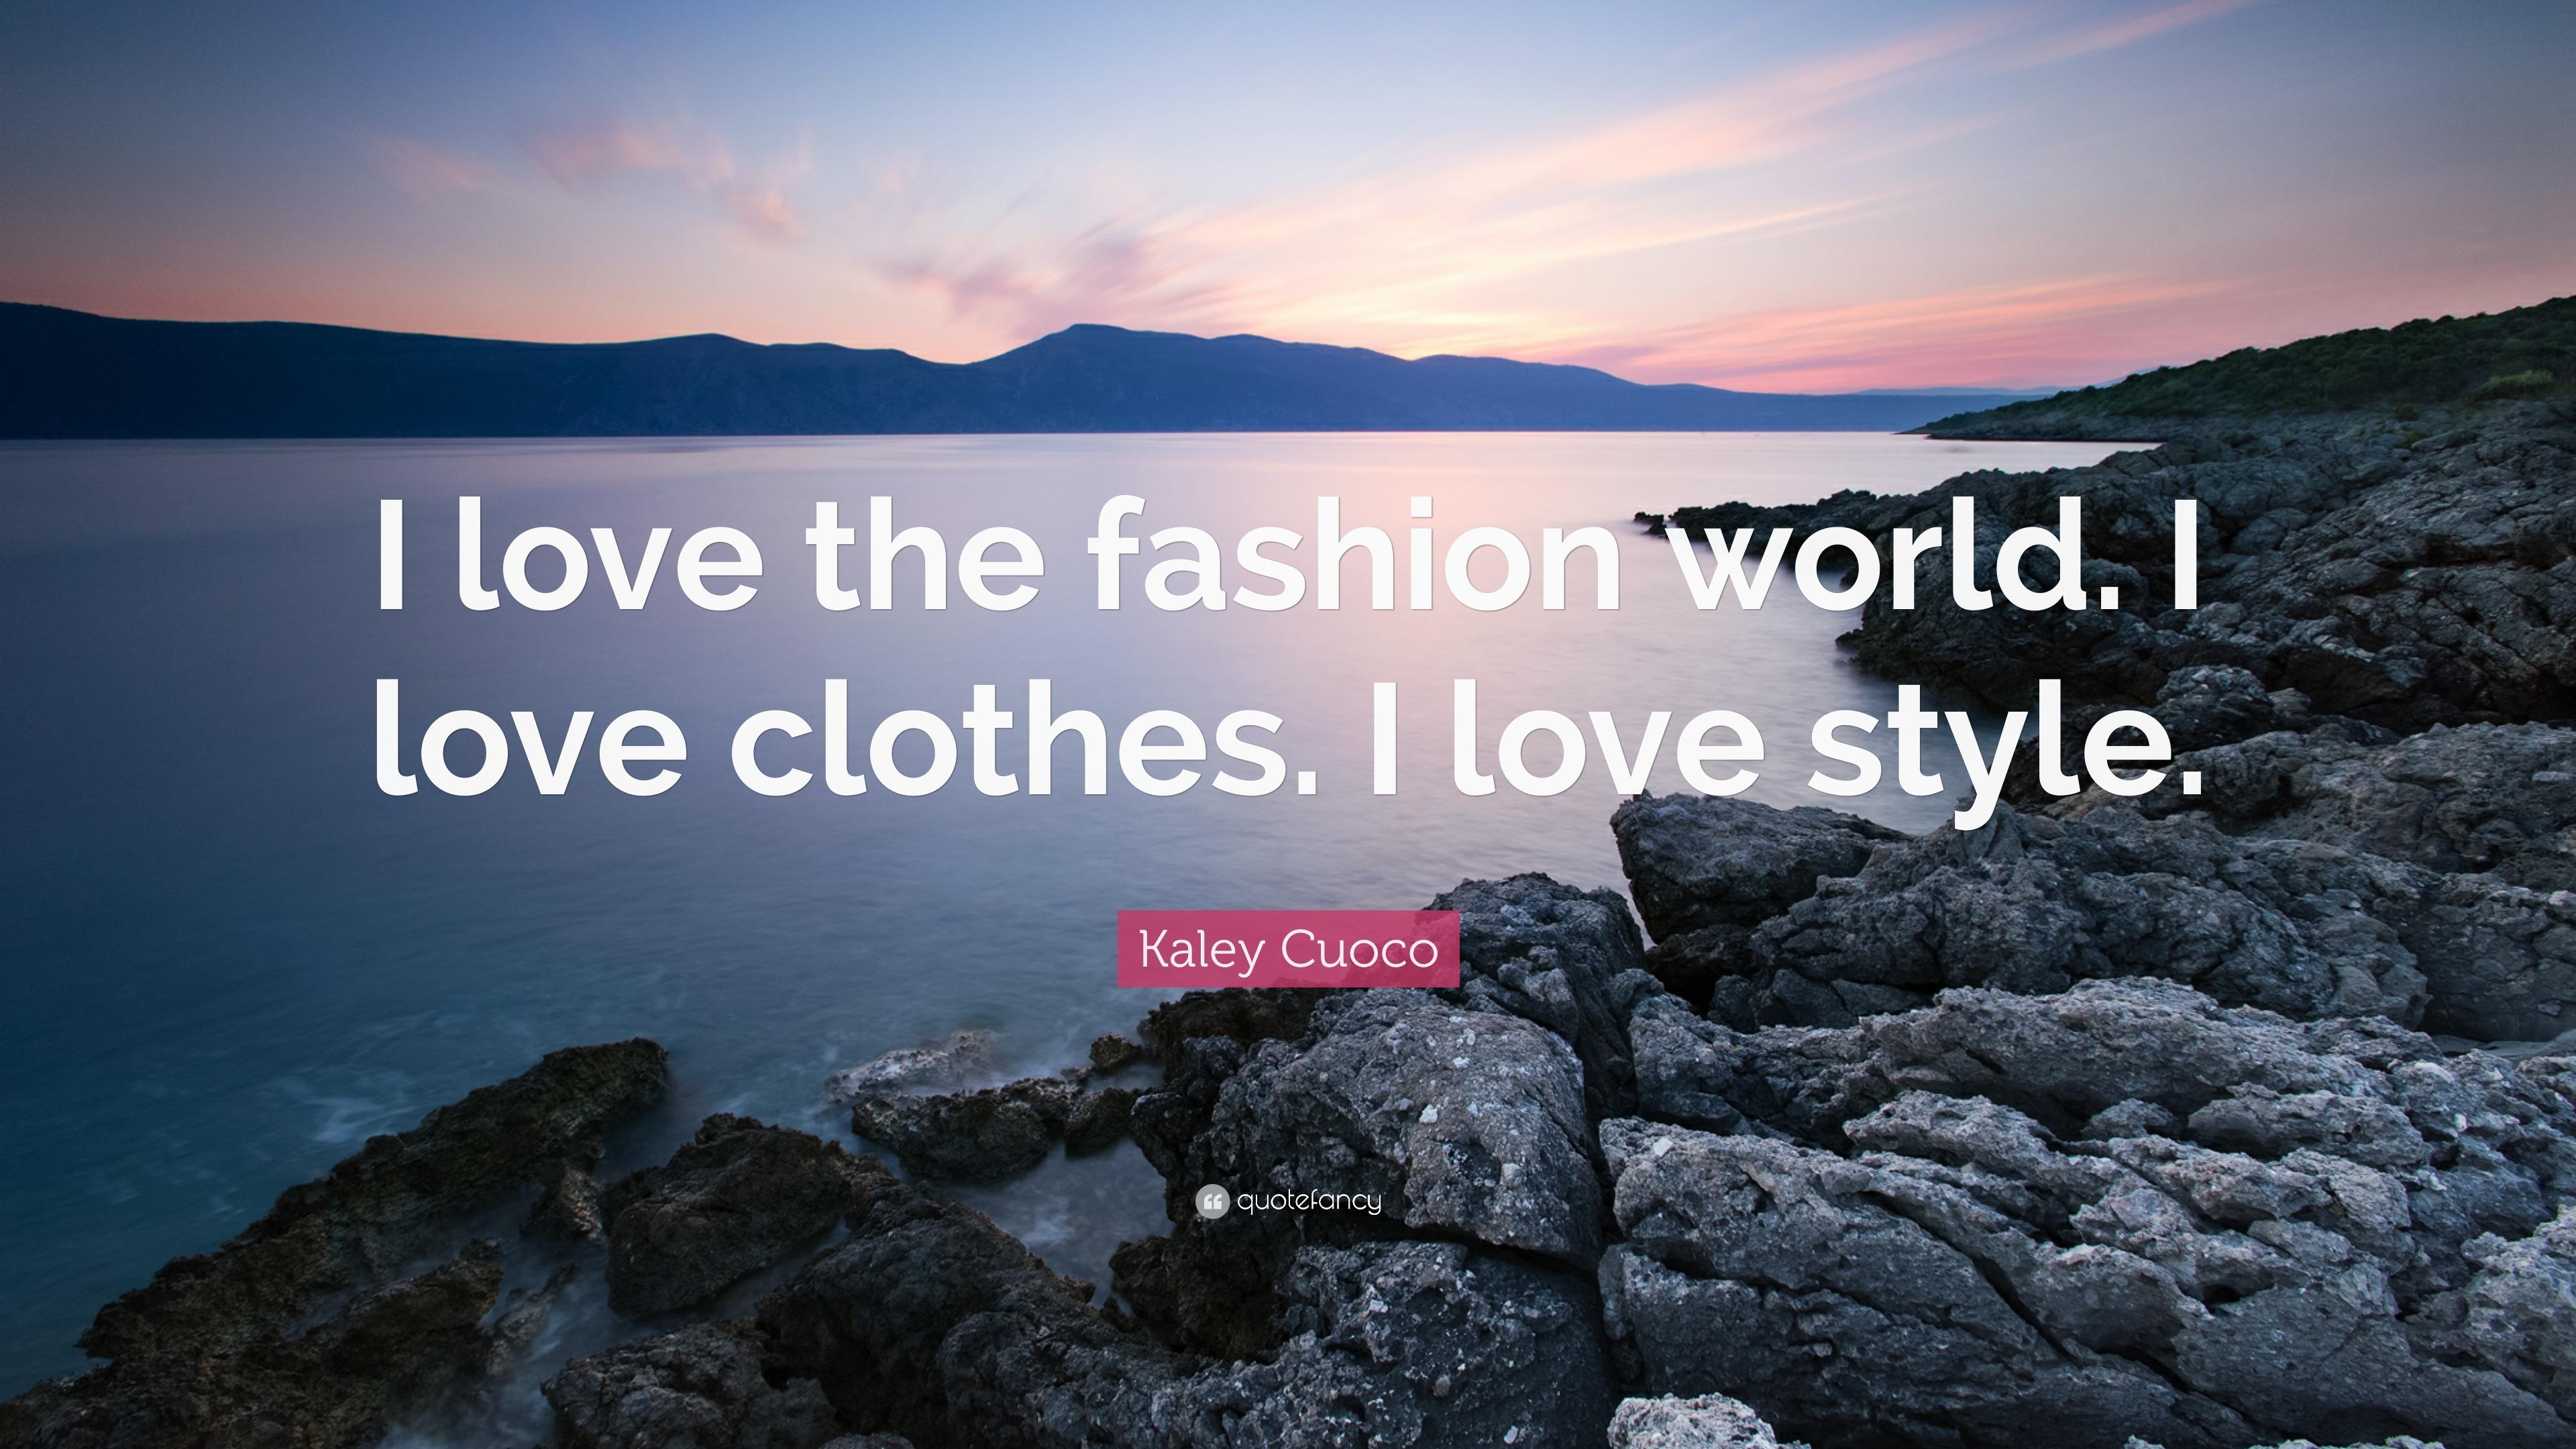 Kaley Cuoco Quote I Love The Fashion World Clothes